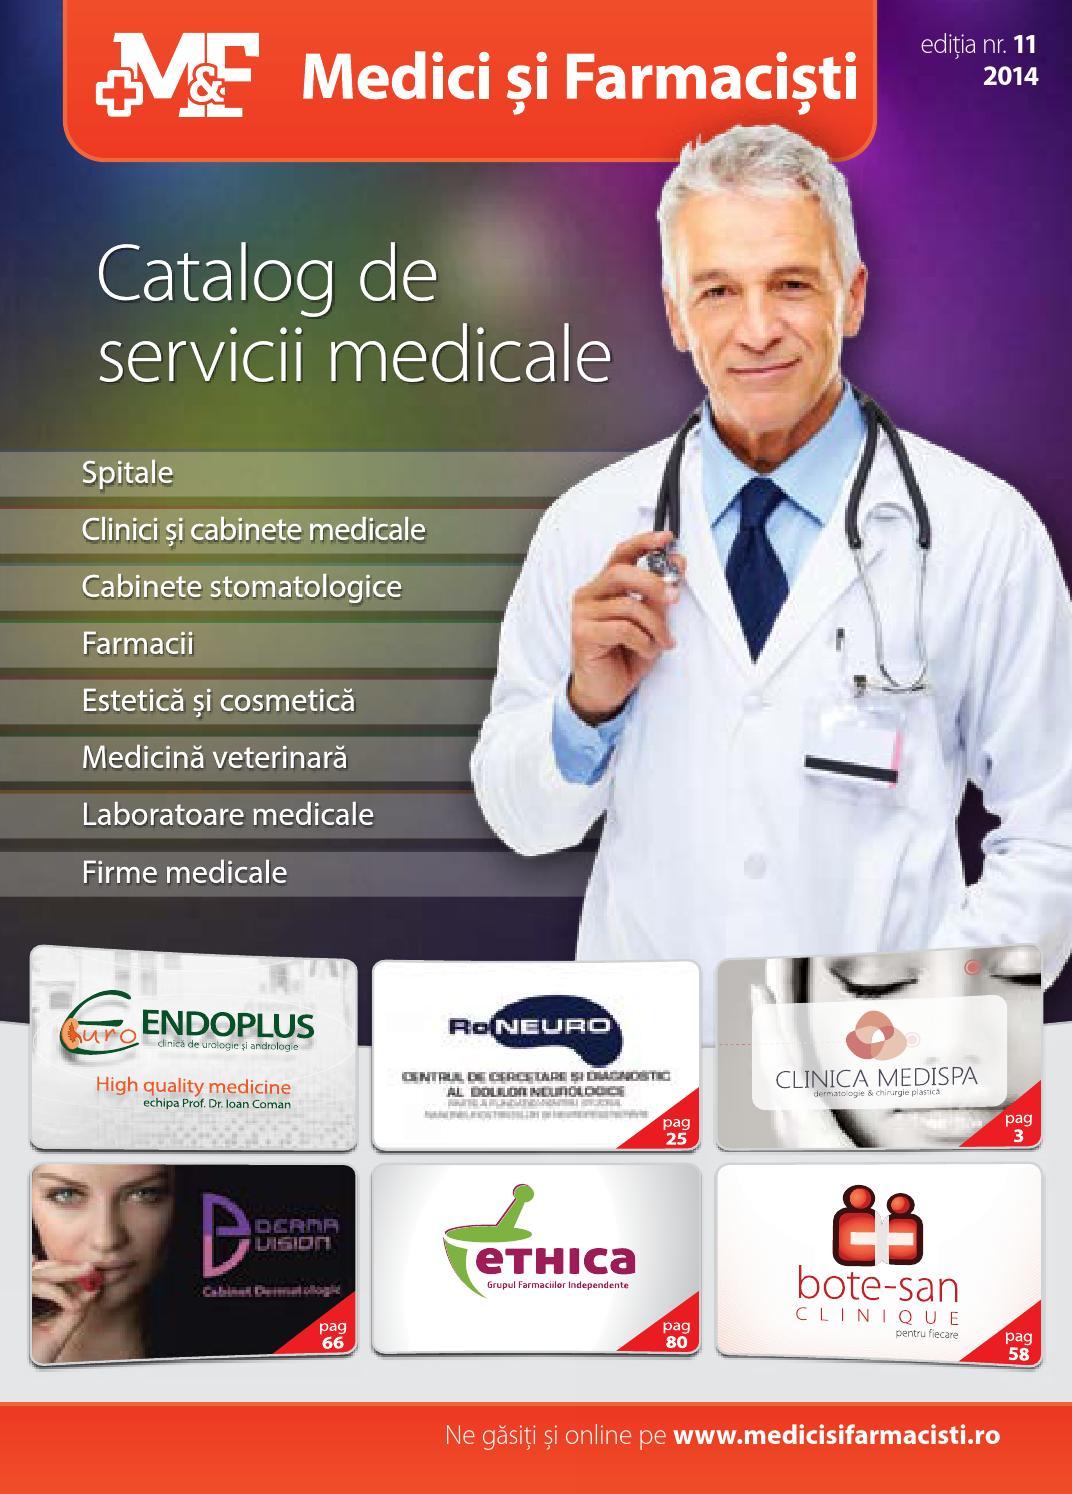 Telefoane mobile Dr popescu monica oftalmologie craiova